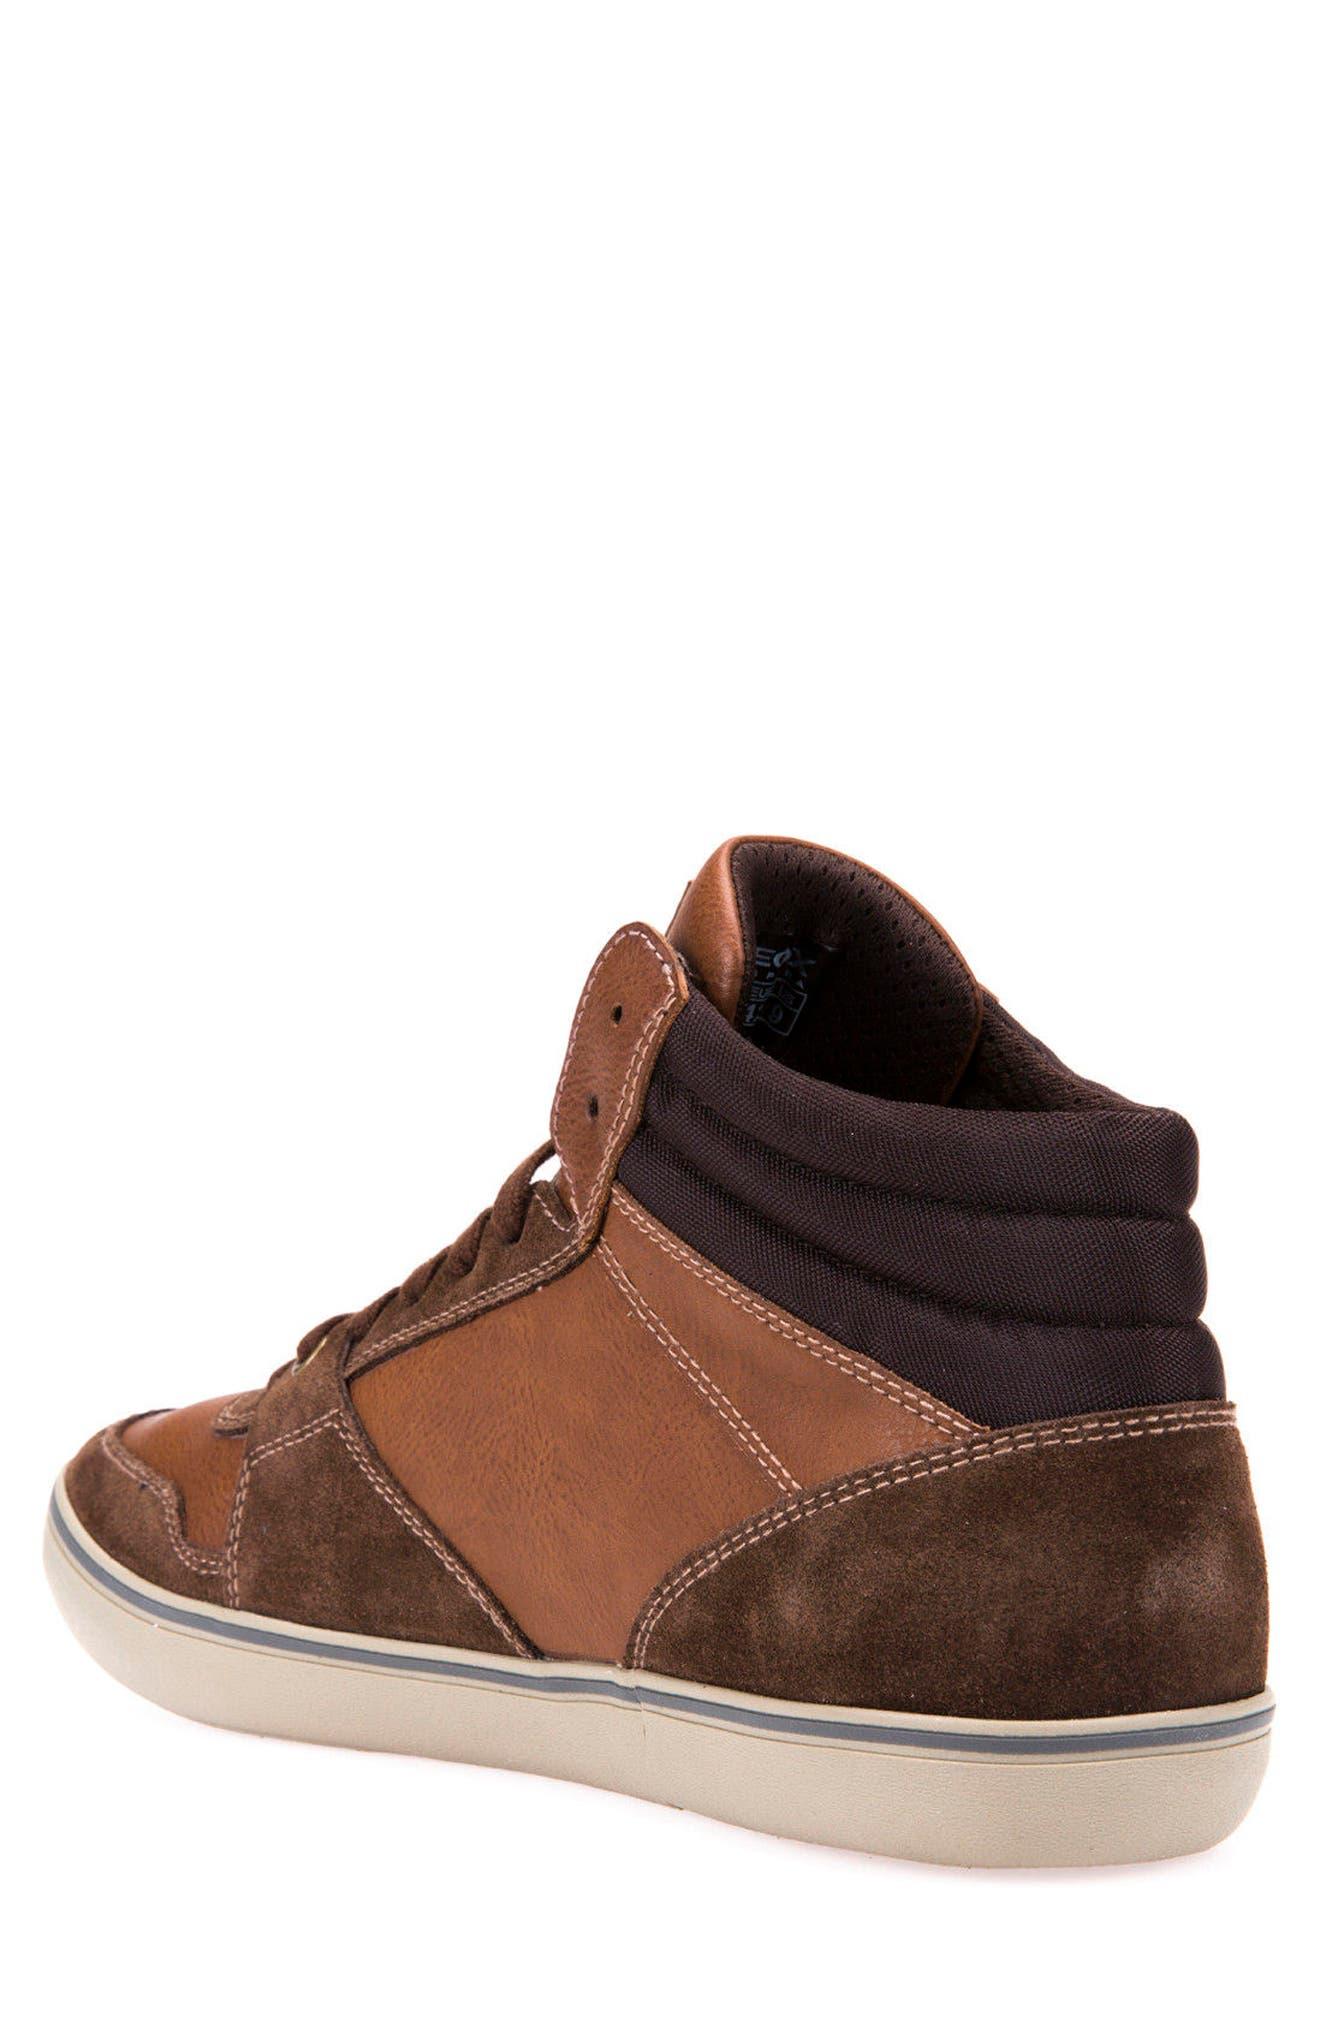 Box 30 High Top Sneaker,                             Alternate thumbnail 2, color,